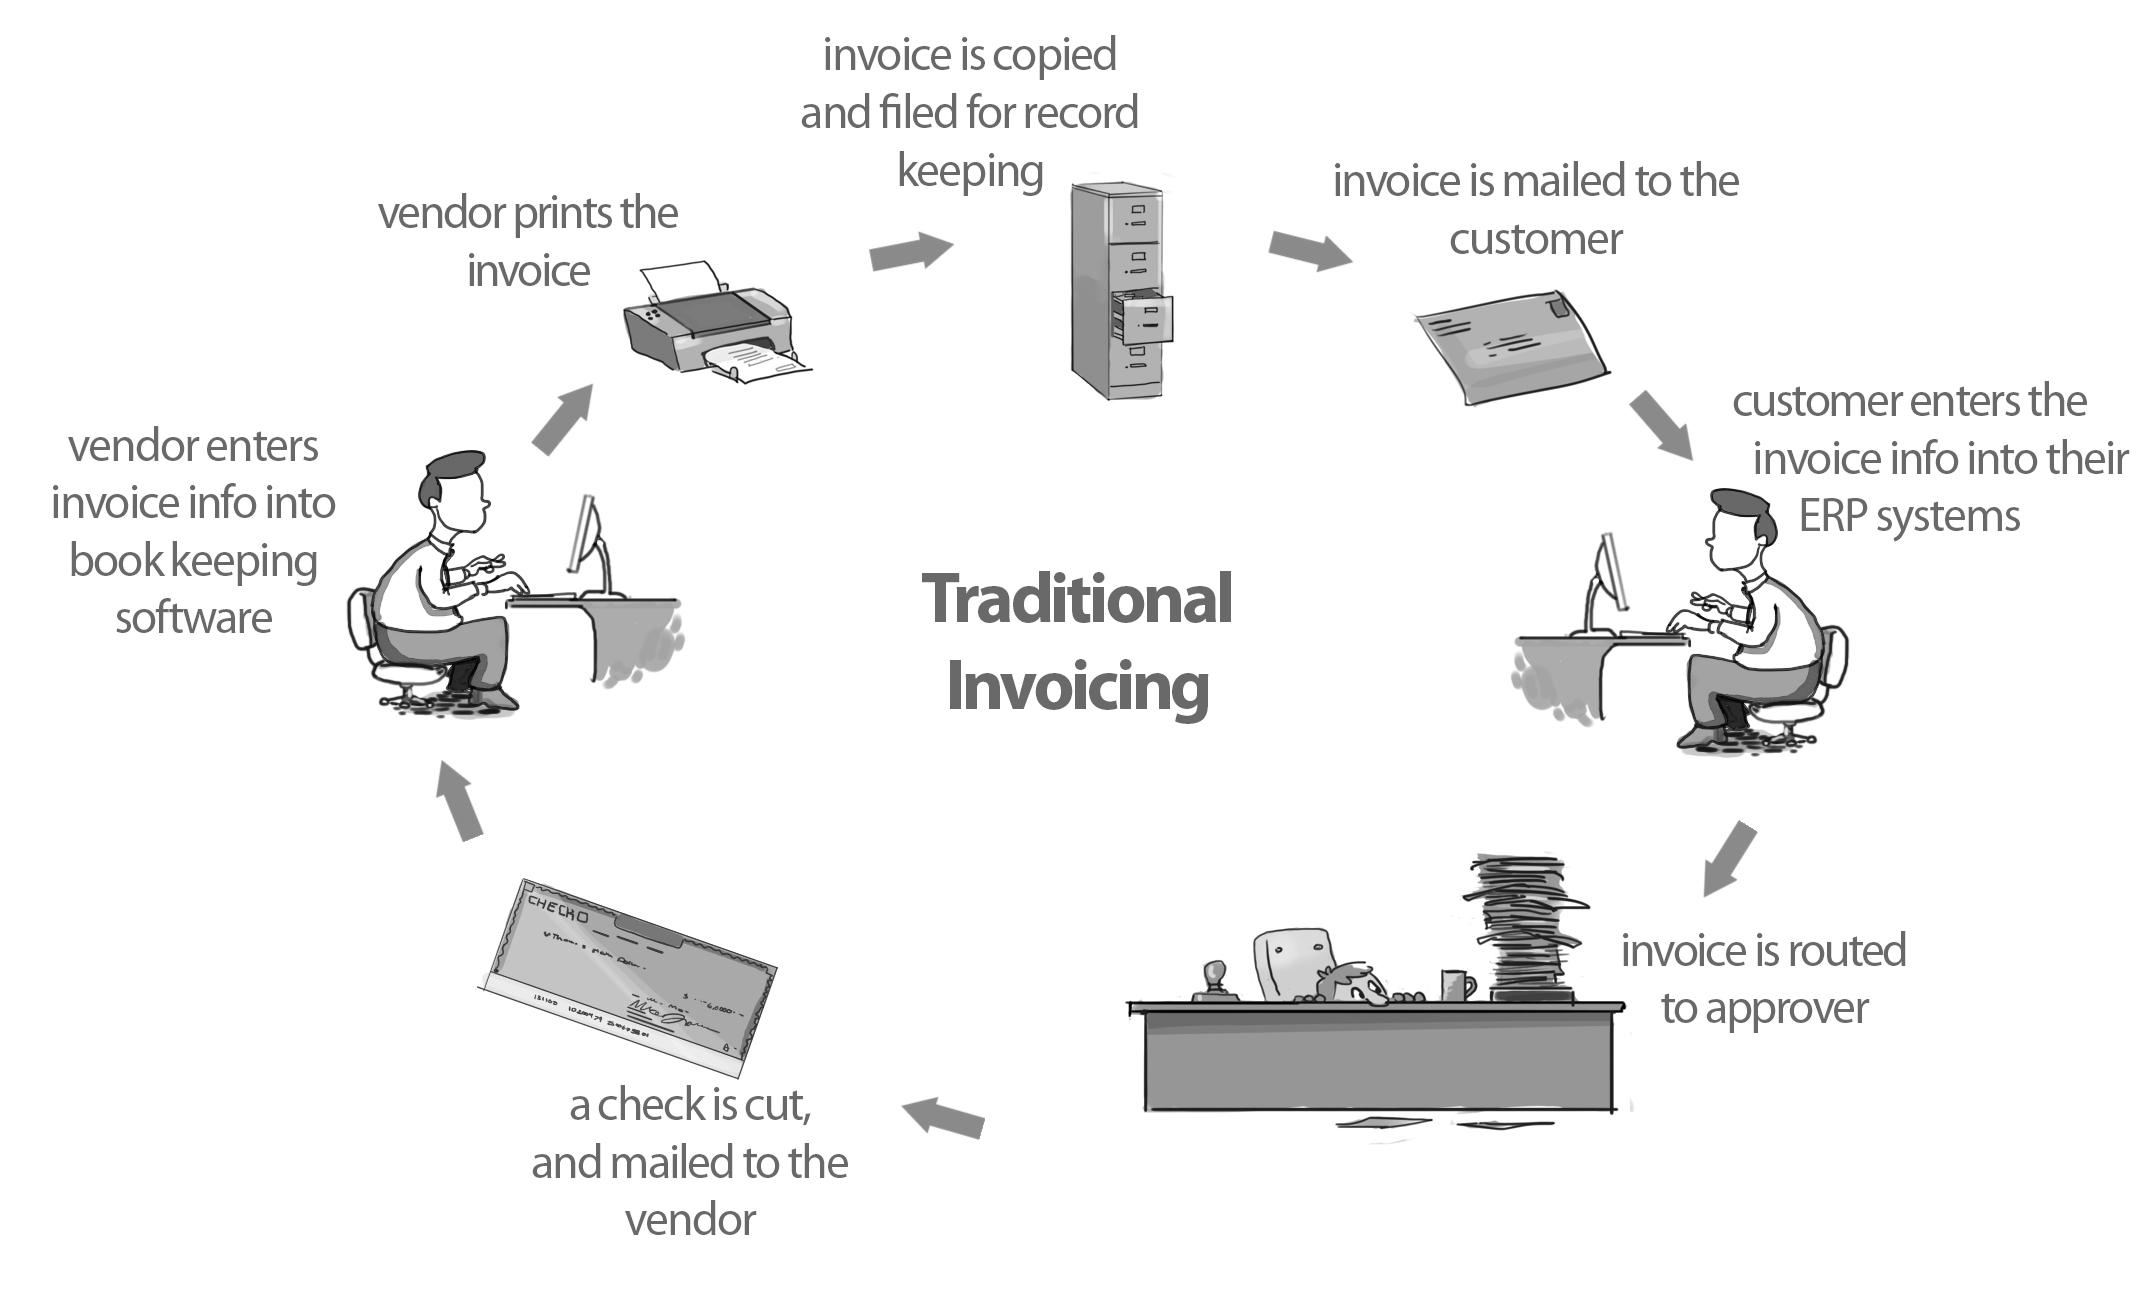 purchase order invoice process invoice template ideas purchase order and invoice process